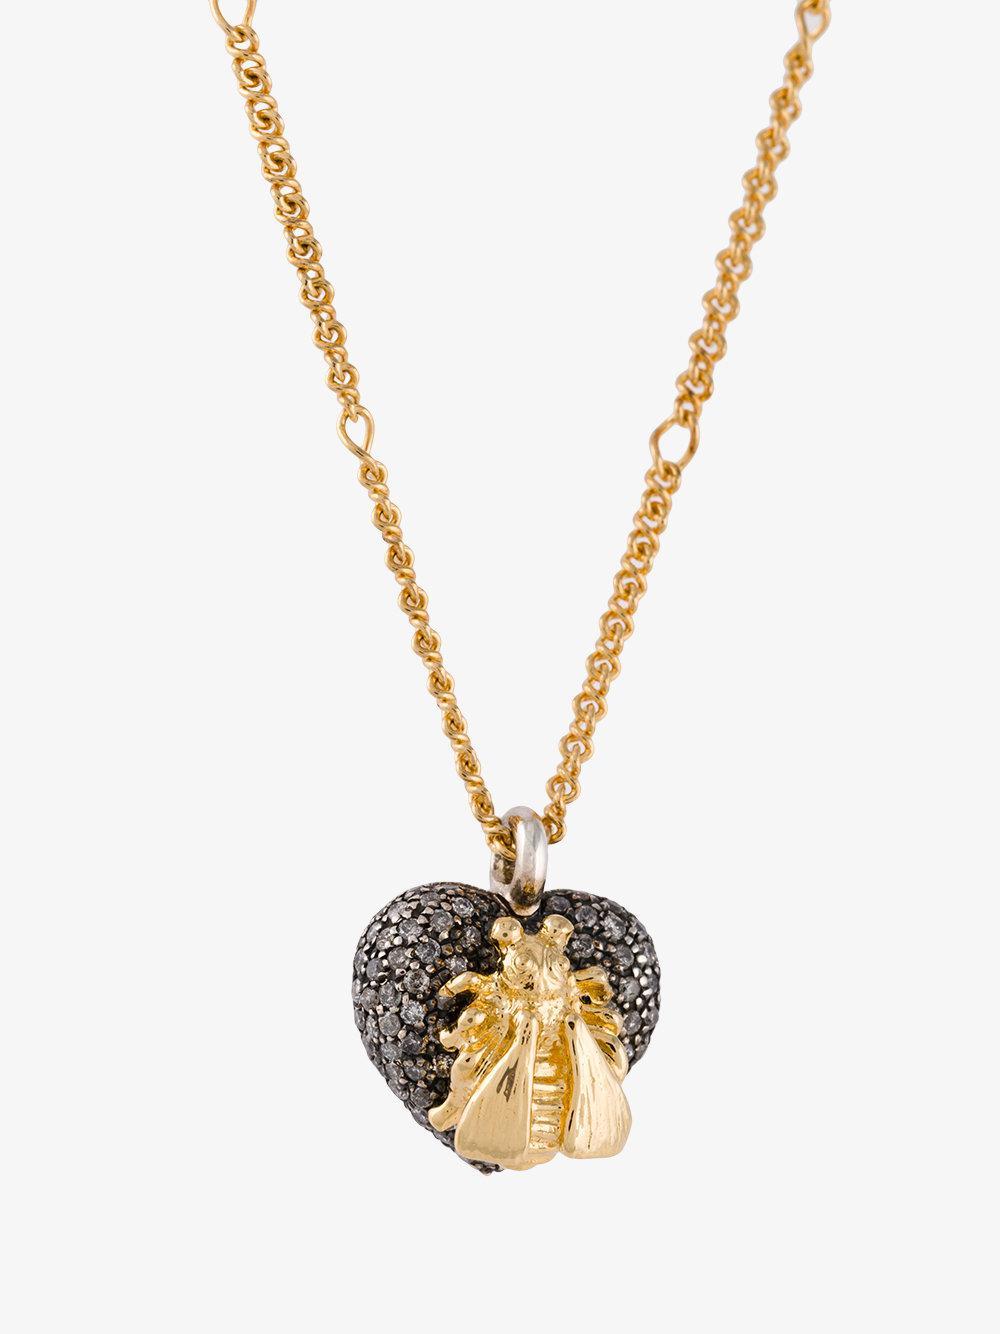 ff477b84d42 Lyst - Gucci 18kt Gold Bee Le Marché Des Merveilles Necklace in Metallic